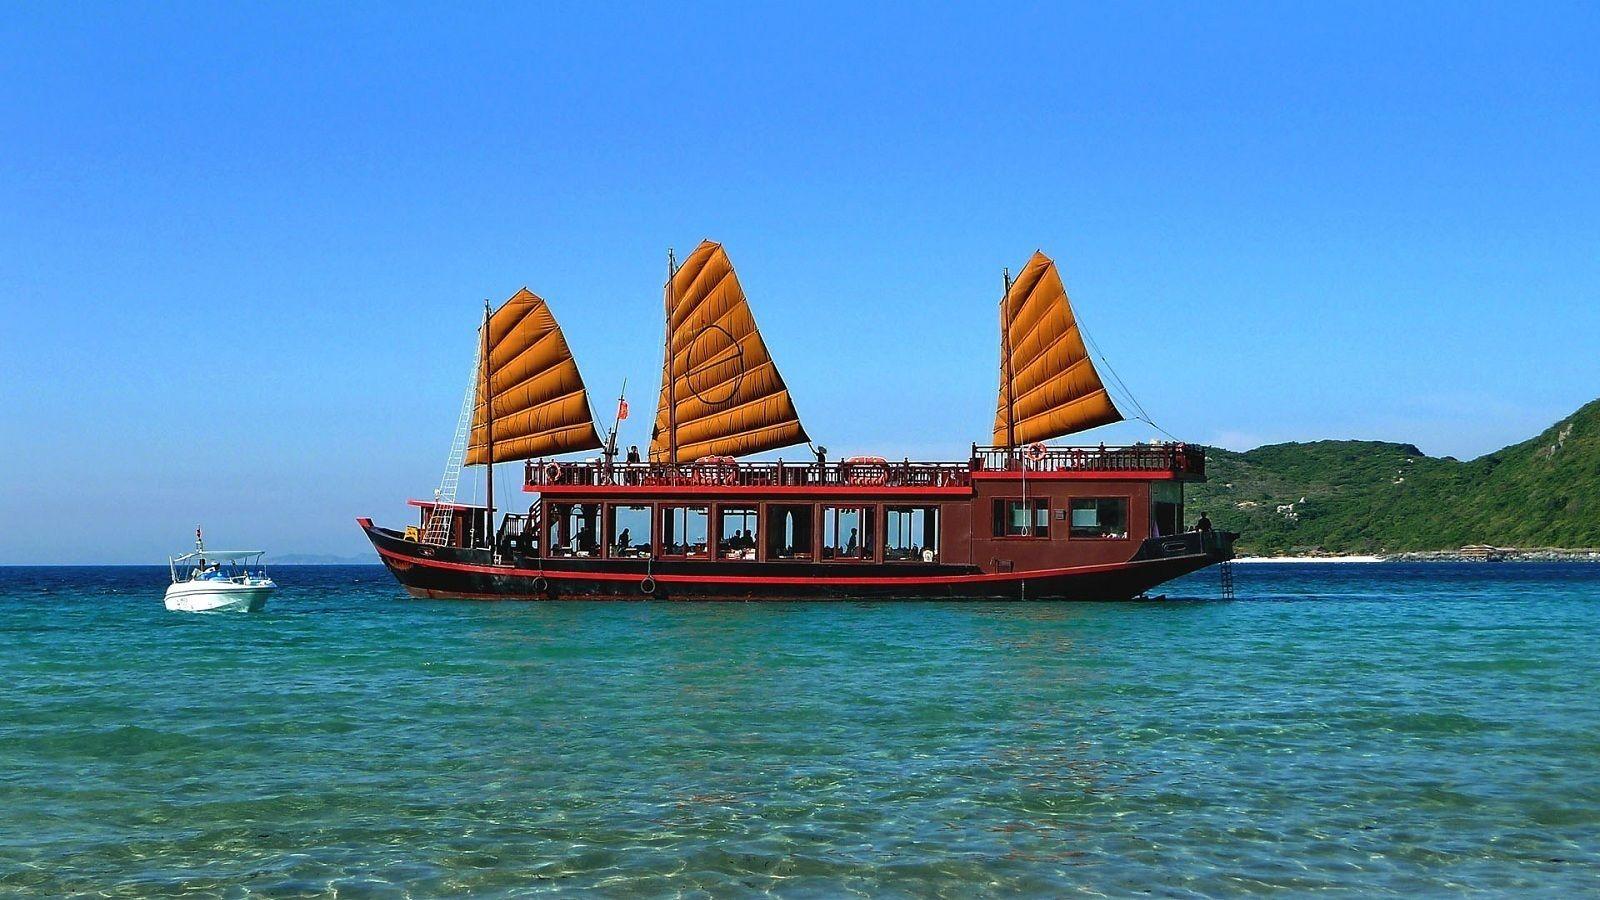 Boat in Nha Trang